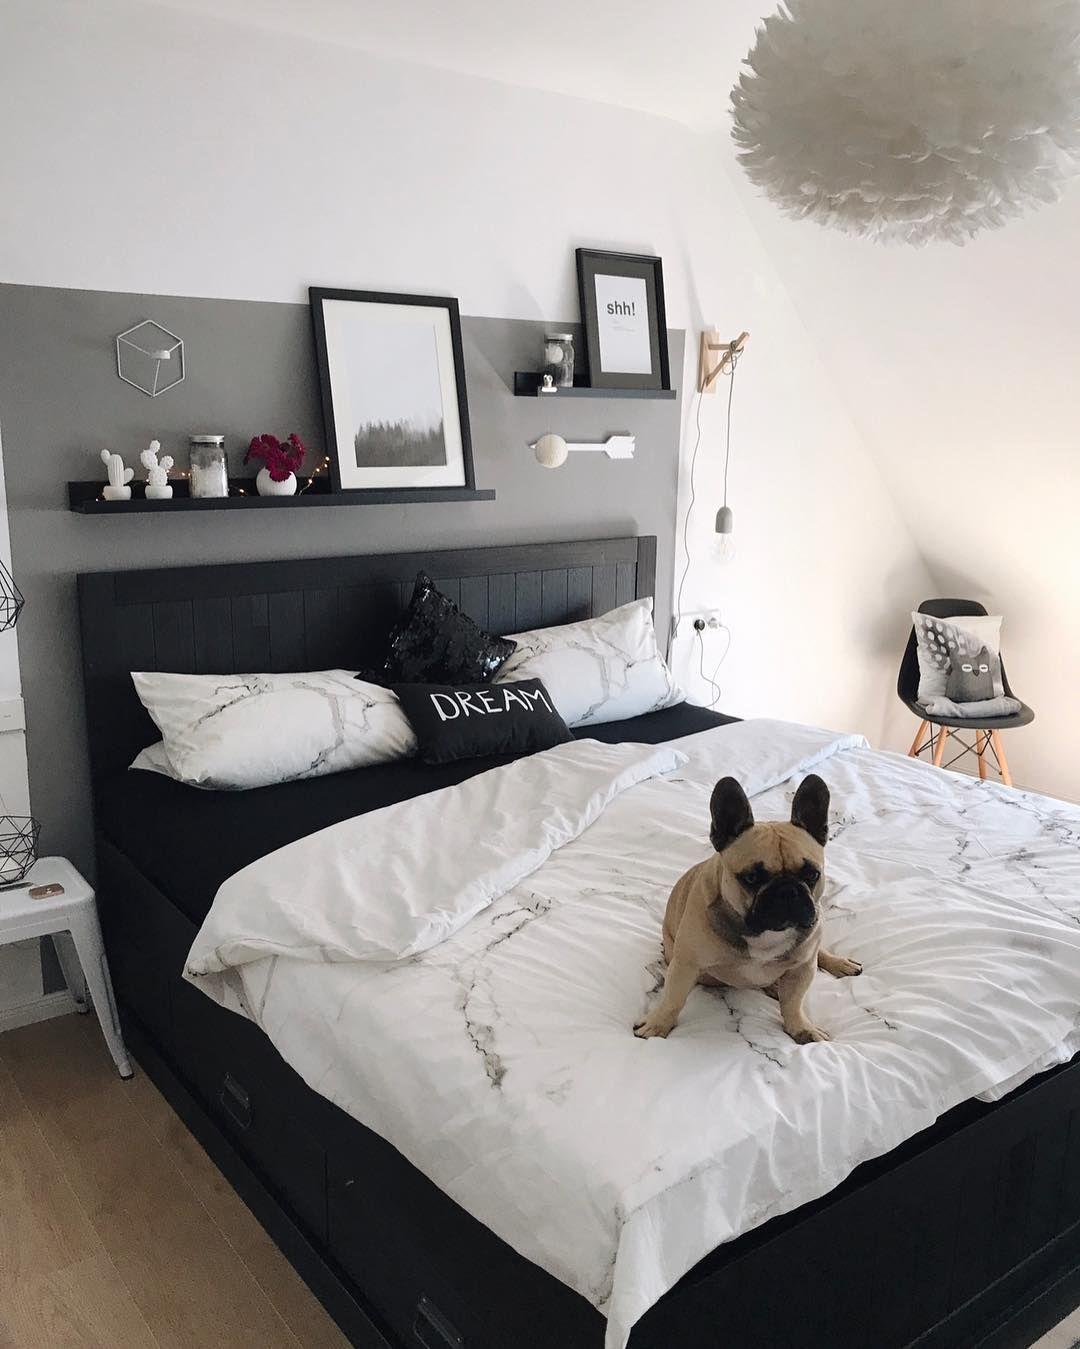 gef llt 1 587 mal 17 kommentare aplaceforus auf. Black Bedroom Furniture Sets. Home Design Ideas